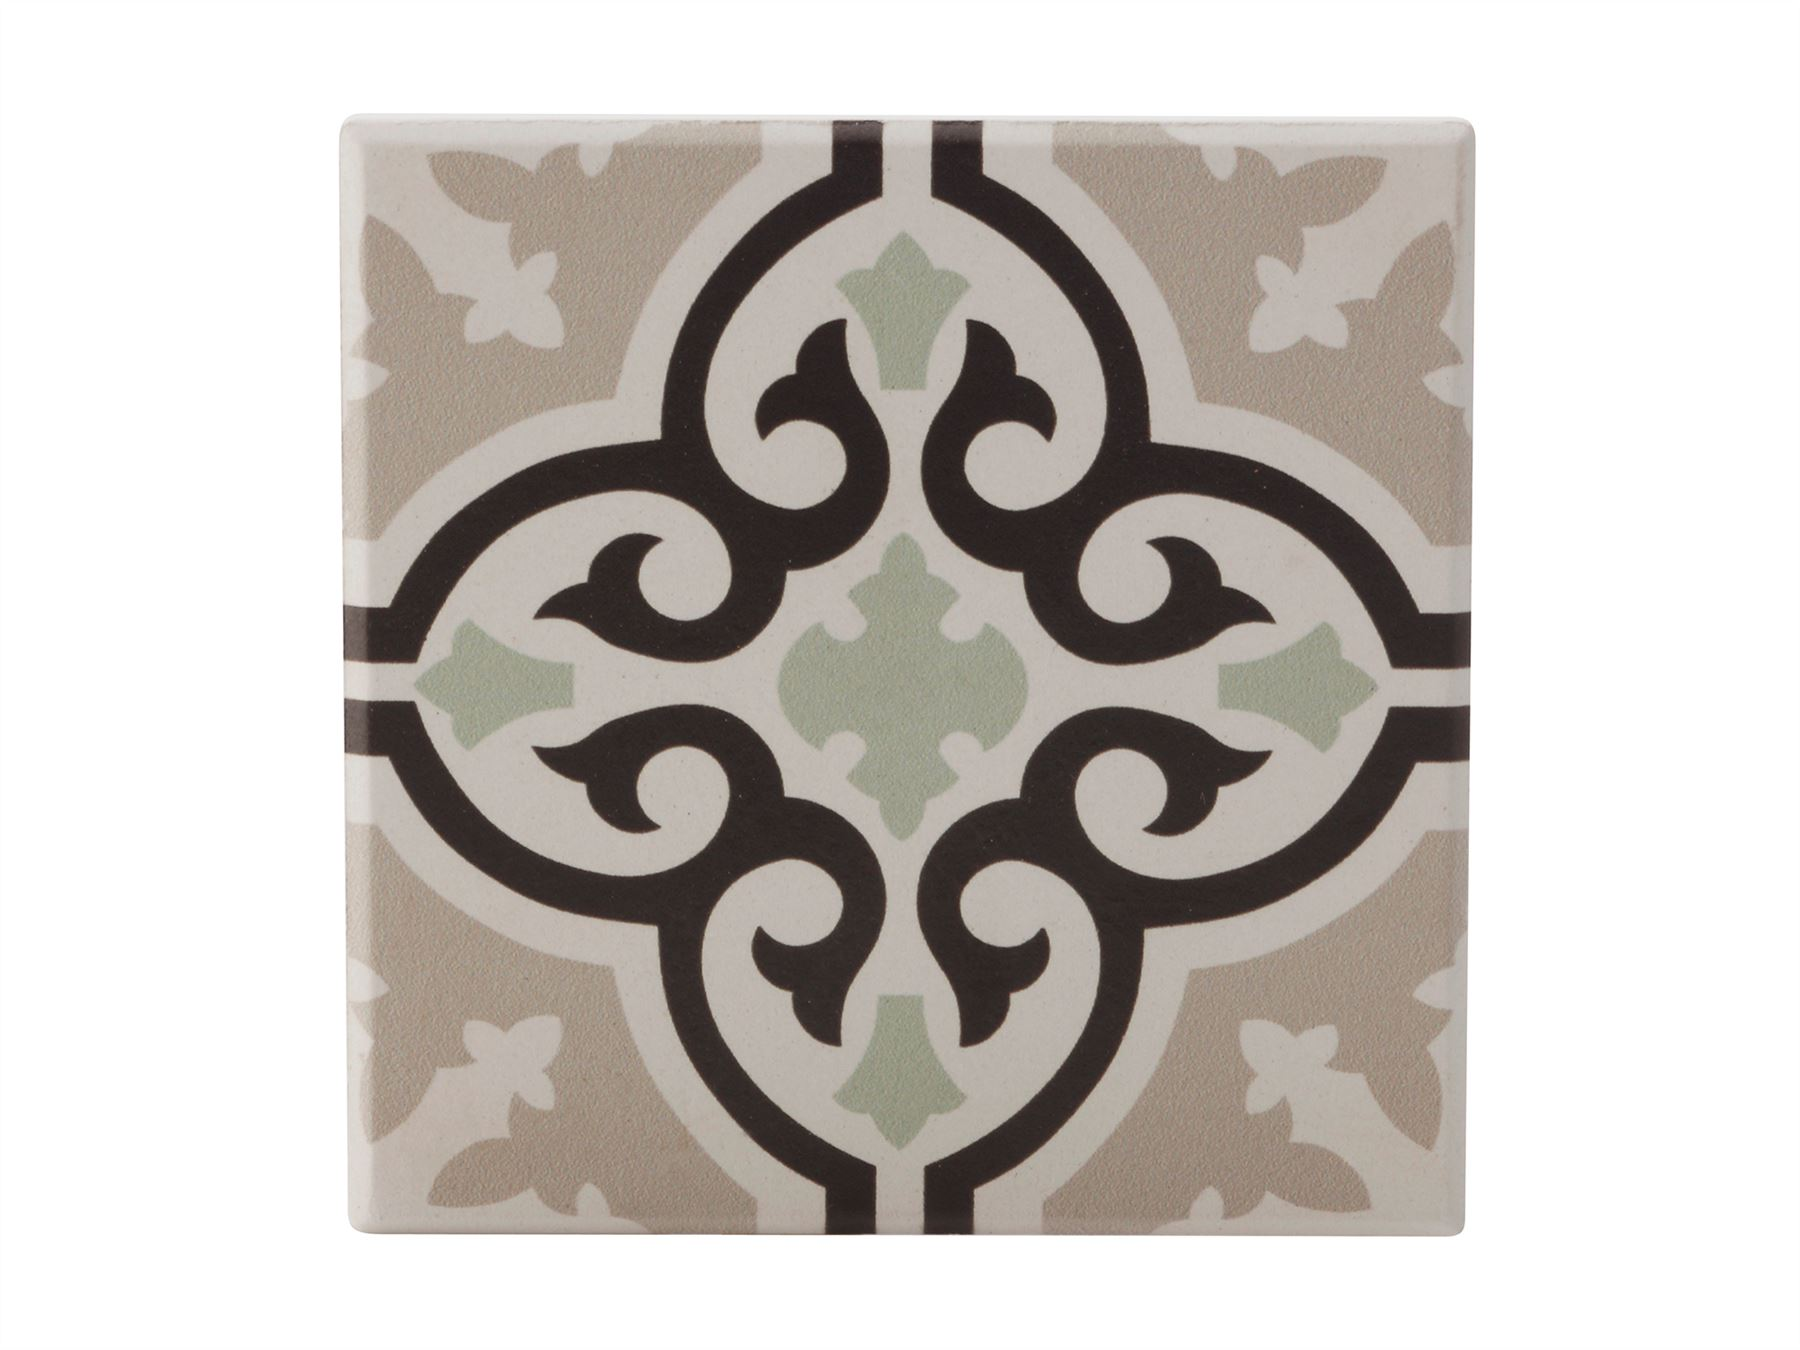 Maxwell Williams Medina Mekes 9cm Ceramic Square Tile Coaster 9315121744124 Ebay